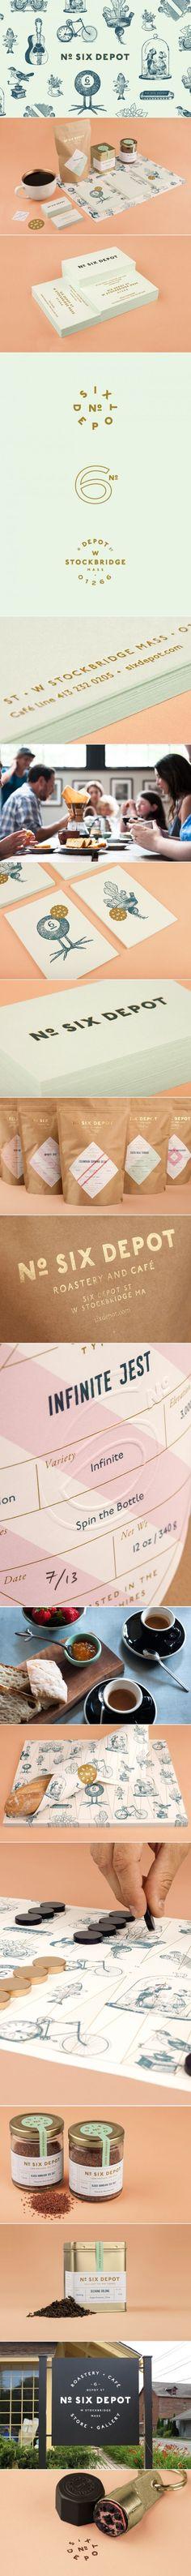 No. Six Depot Coffee Roaster & Cafe   Perky Bros.